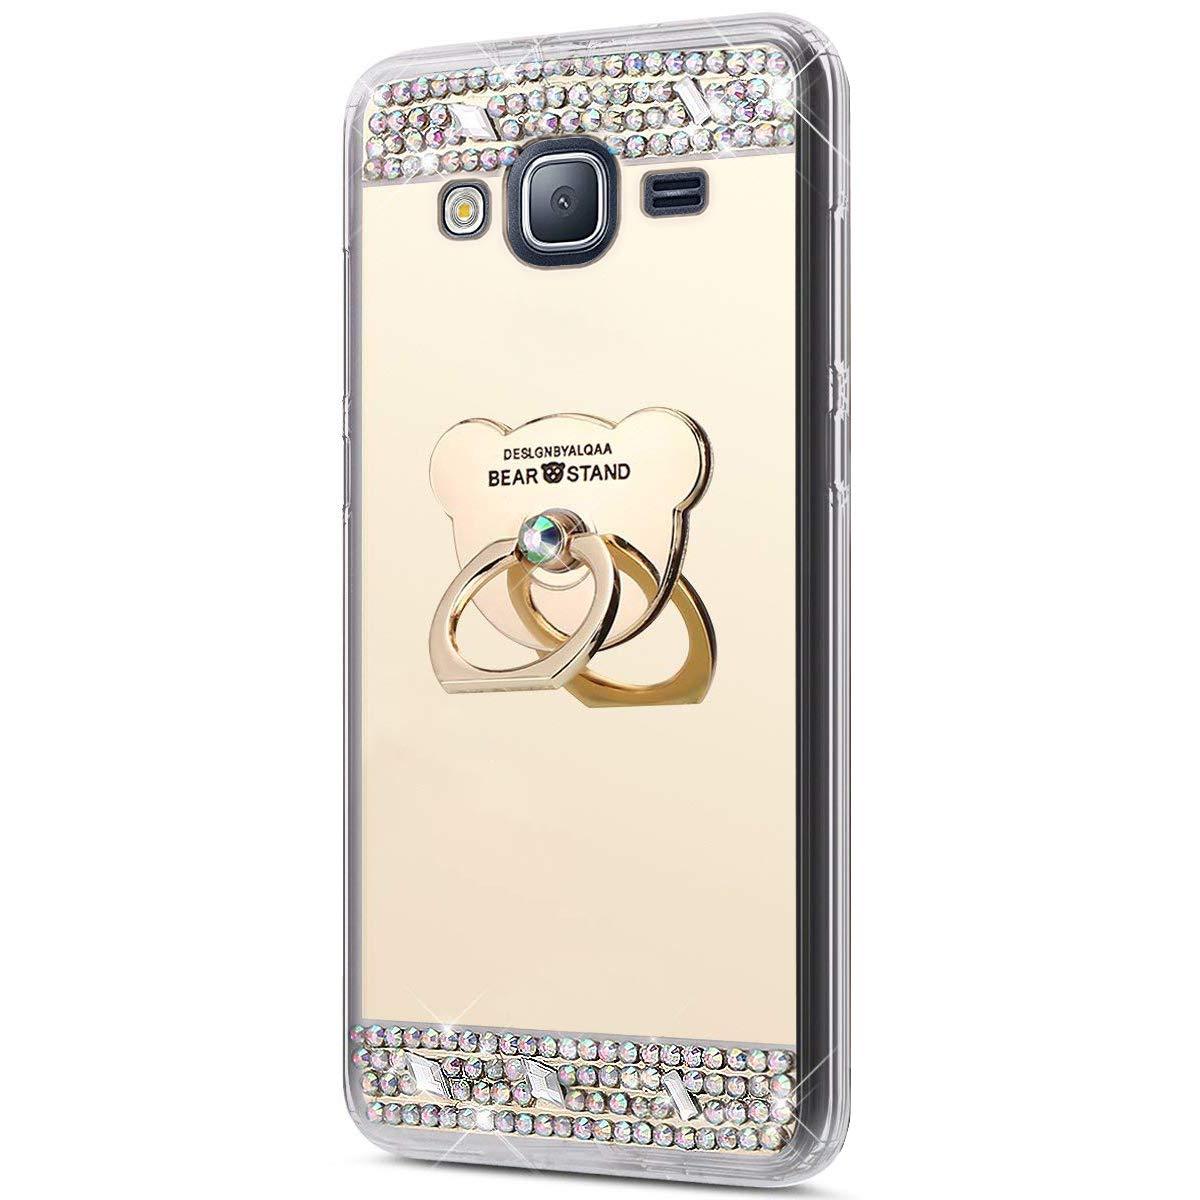 Galaxy J3 2016 Hü lle,Surakey Schutzhü lle fü r Samsung Galaxy J3 2016 Silikon Handyhü lle Spiegel Hü lle Bling Strass TPU Handyhü lle Weiche TPU Telefon-Kasten Mirror Case fü r Samsung Galaxy J3 2016, Gold ELE00161MD